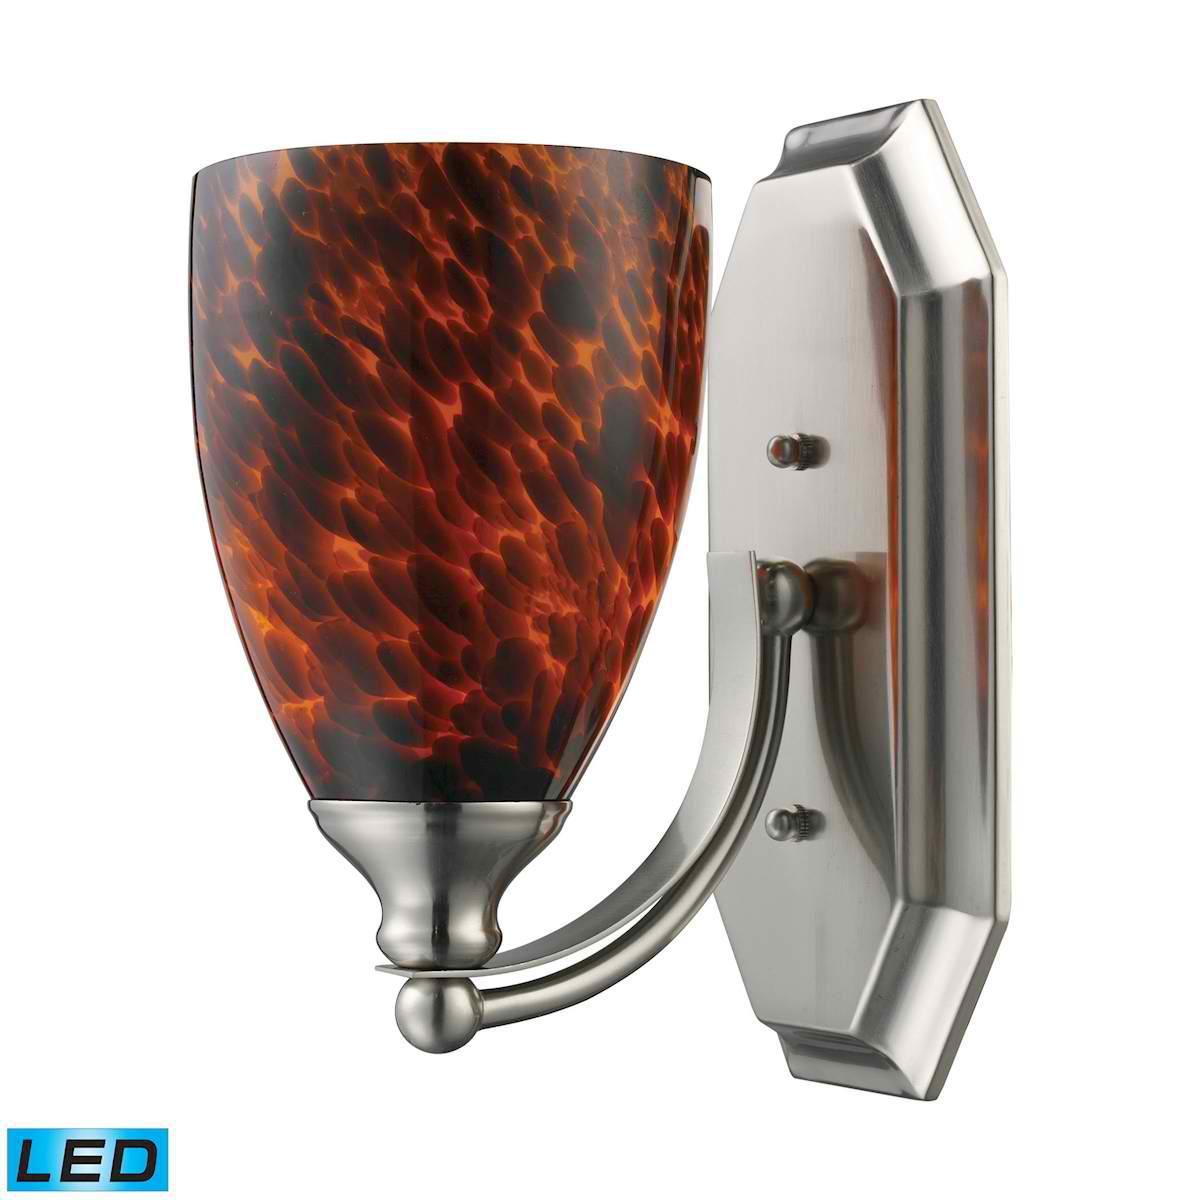 1 Light Vanity in Satin Nickel and Espresso Glass - LED Offering Up To 800 Lumens (60 Watt Equivalent)